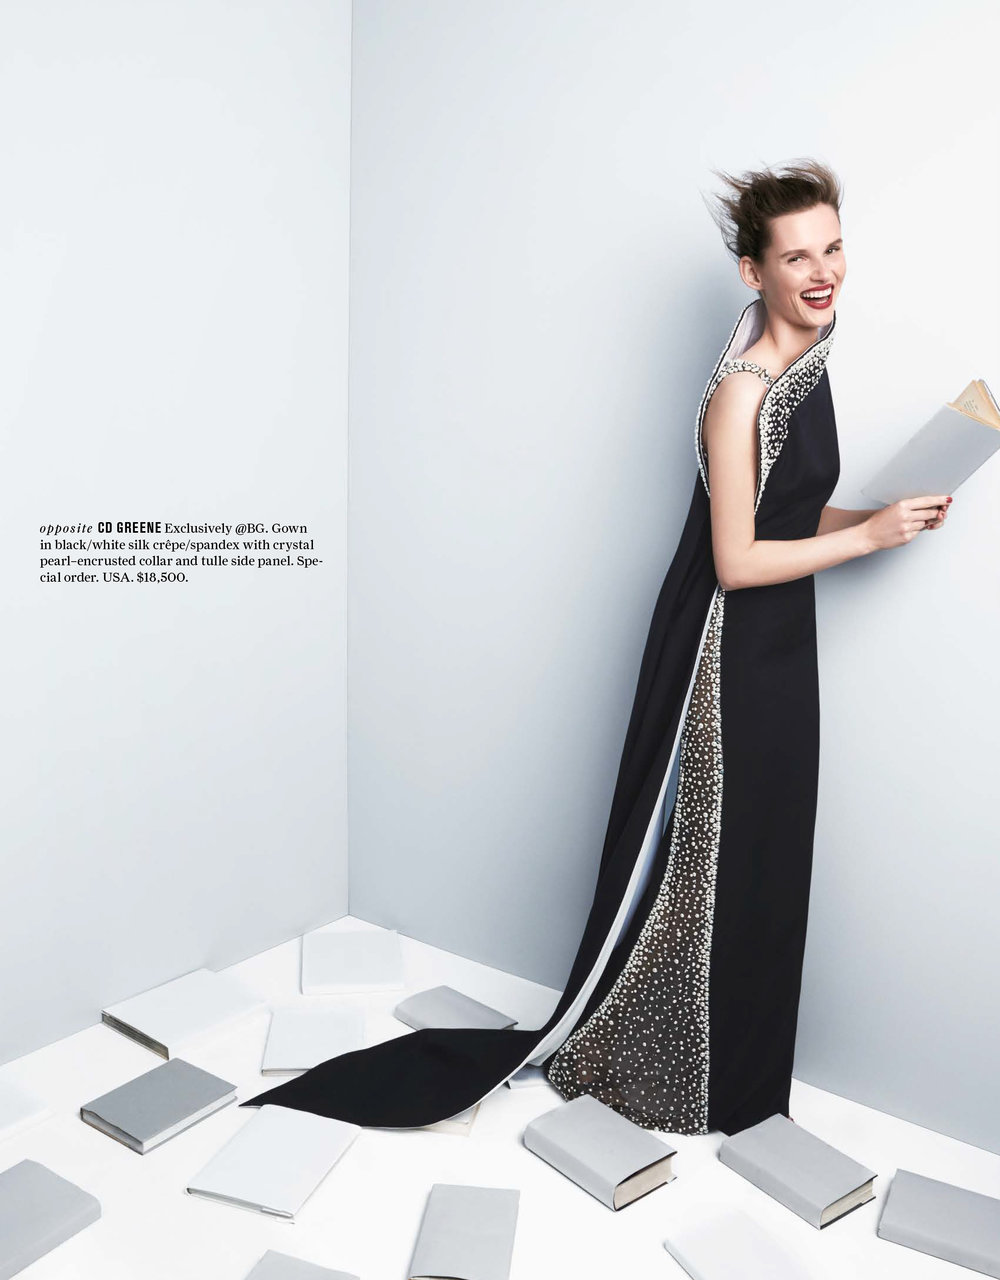 Bergdorf Goodman Magazine Spring 2017